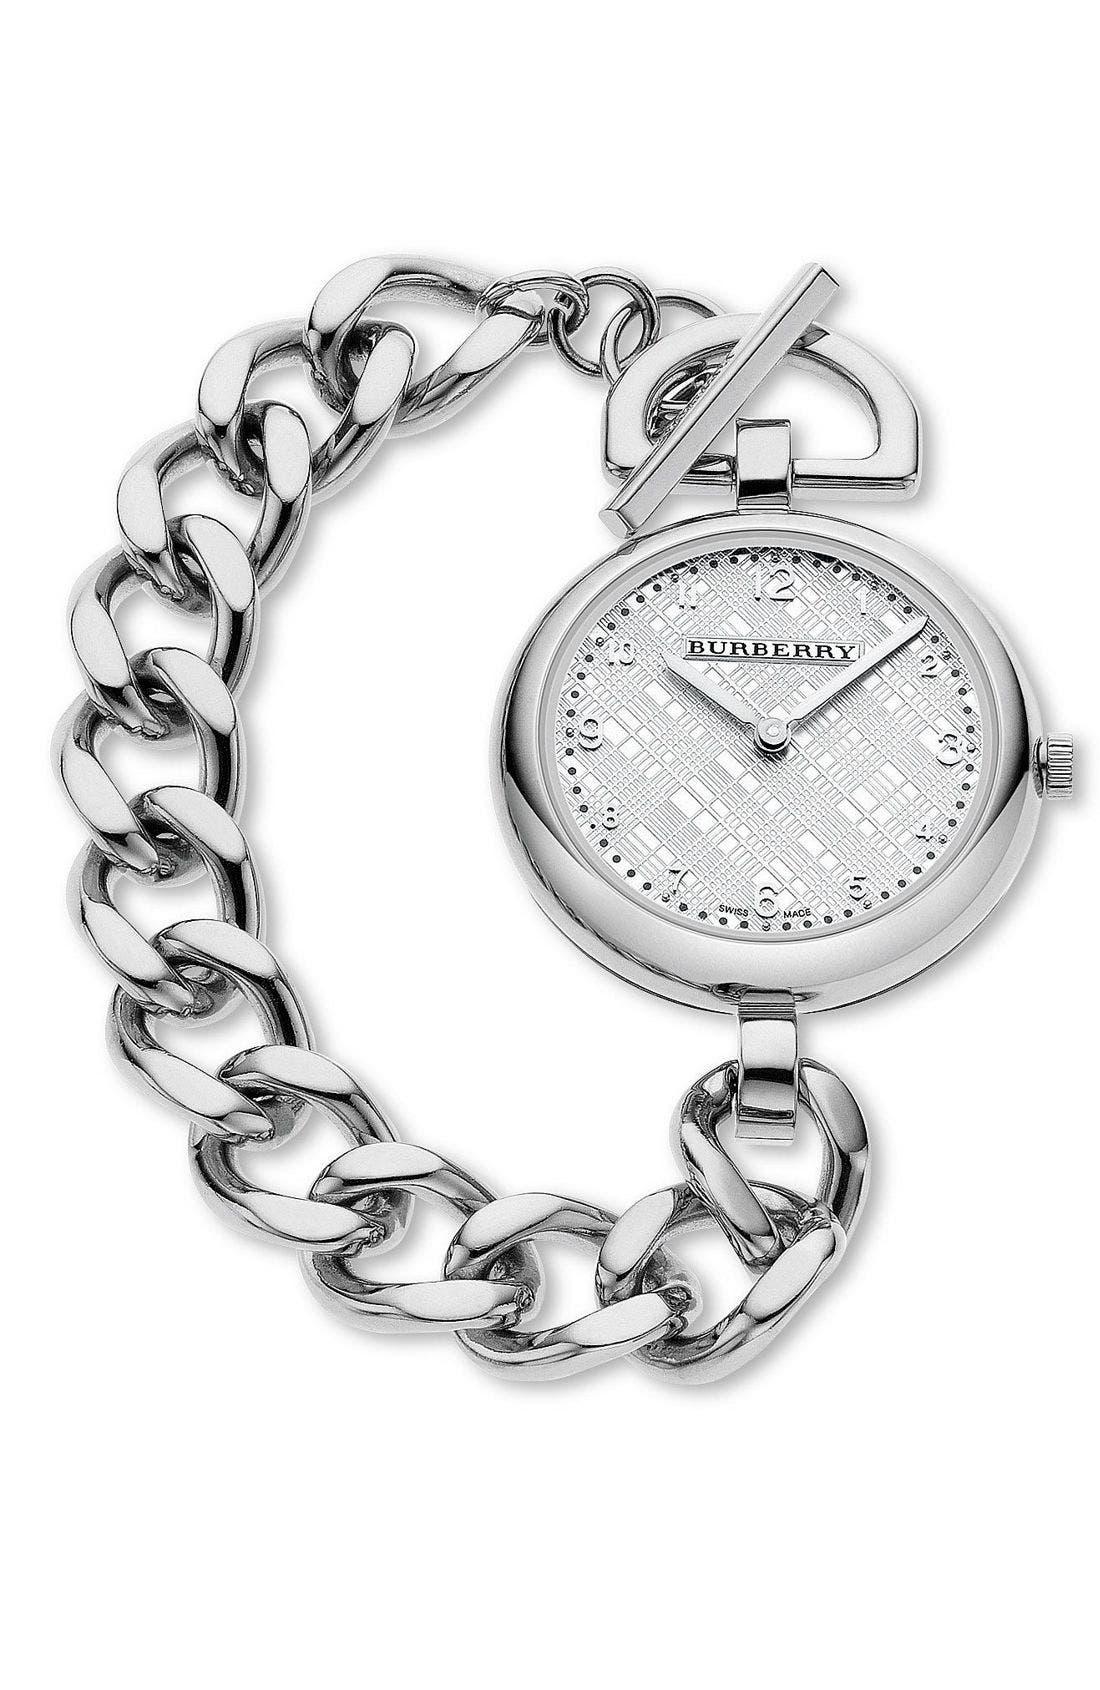 Main Image - Burberry Oversized Link Bracelet Watch